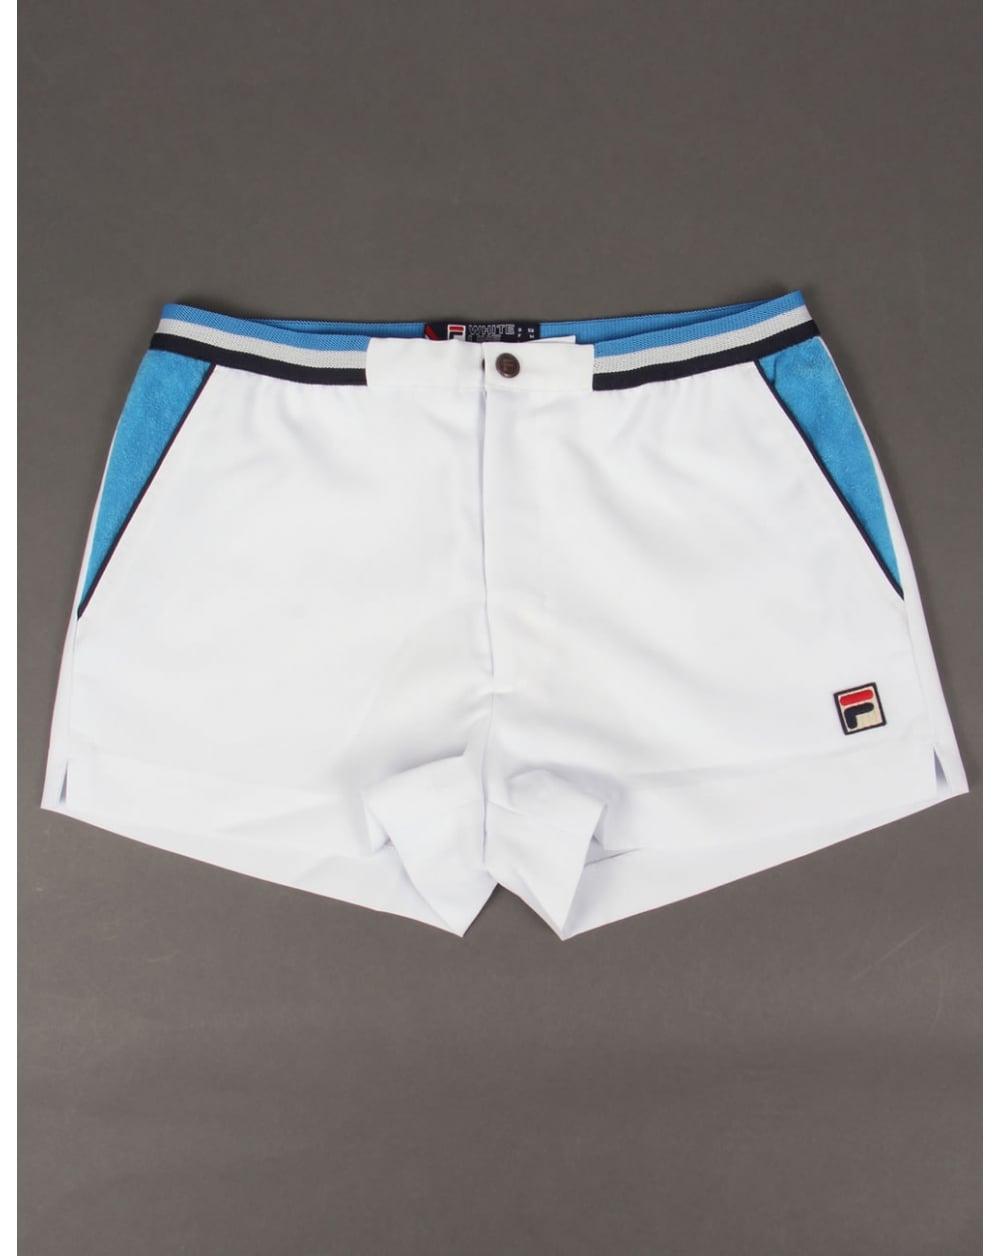 Fila Vintage Mk2 Settanta Shorts White/ocean Blue/navy - vintage ...